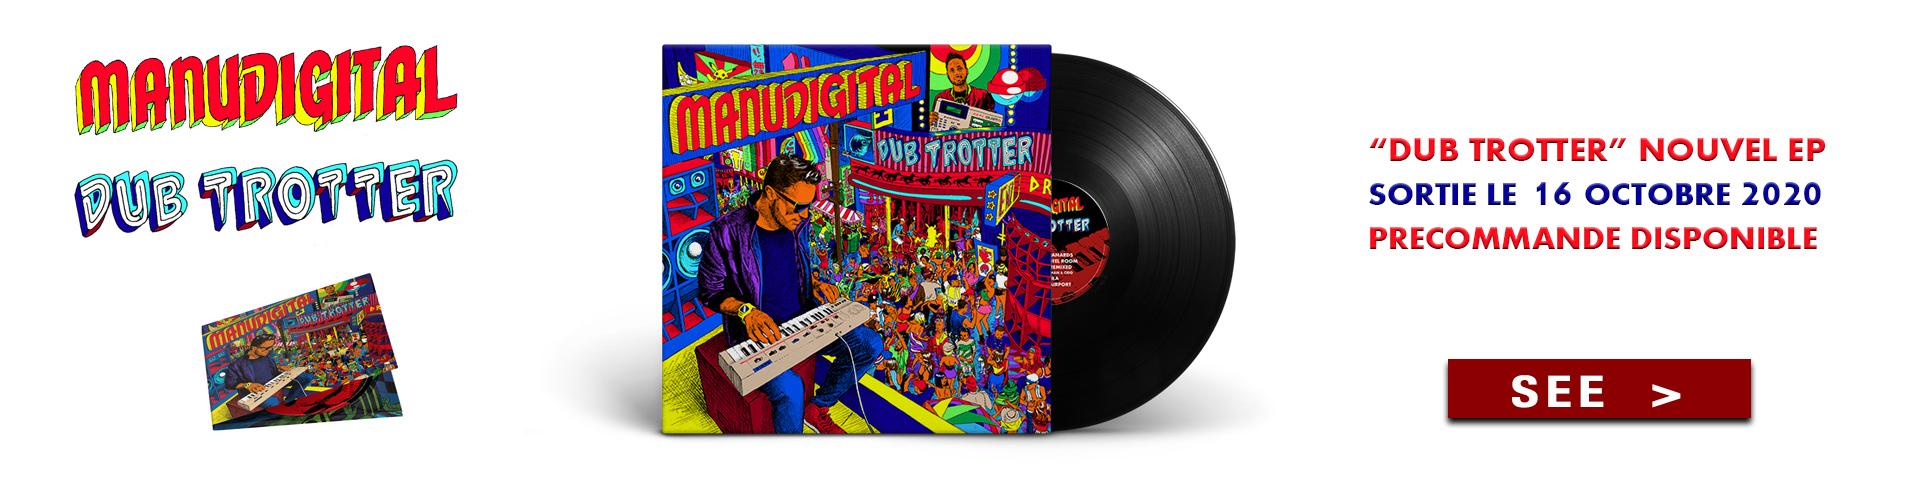 Manudigital-Dub-Trotter-EP-EN